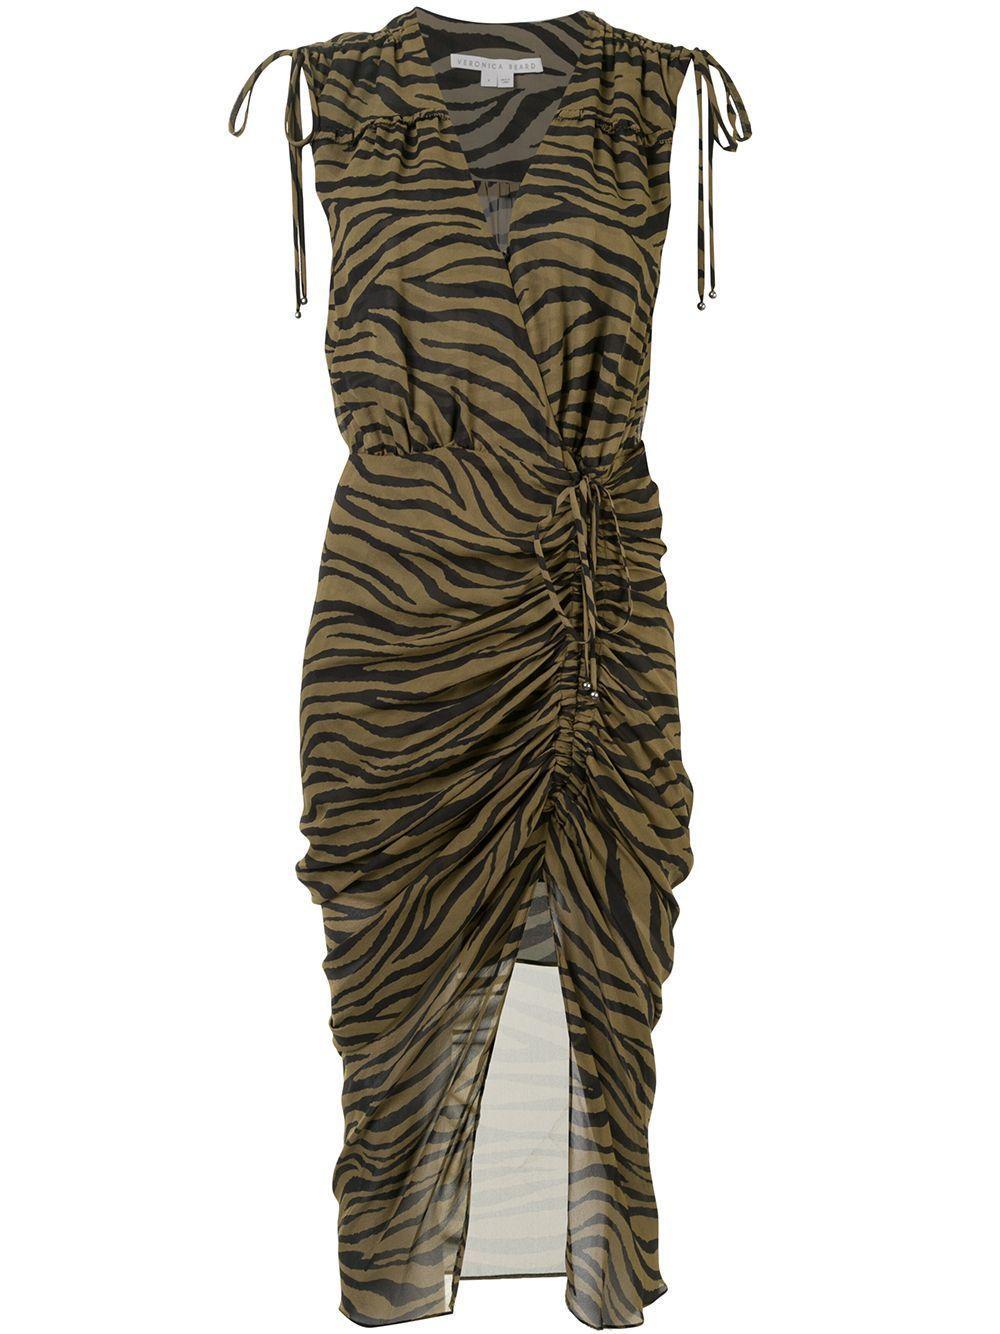 Teagan Dress Item # 2006GGT062264